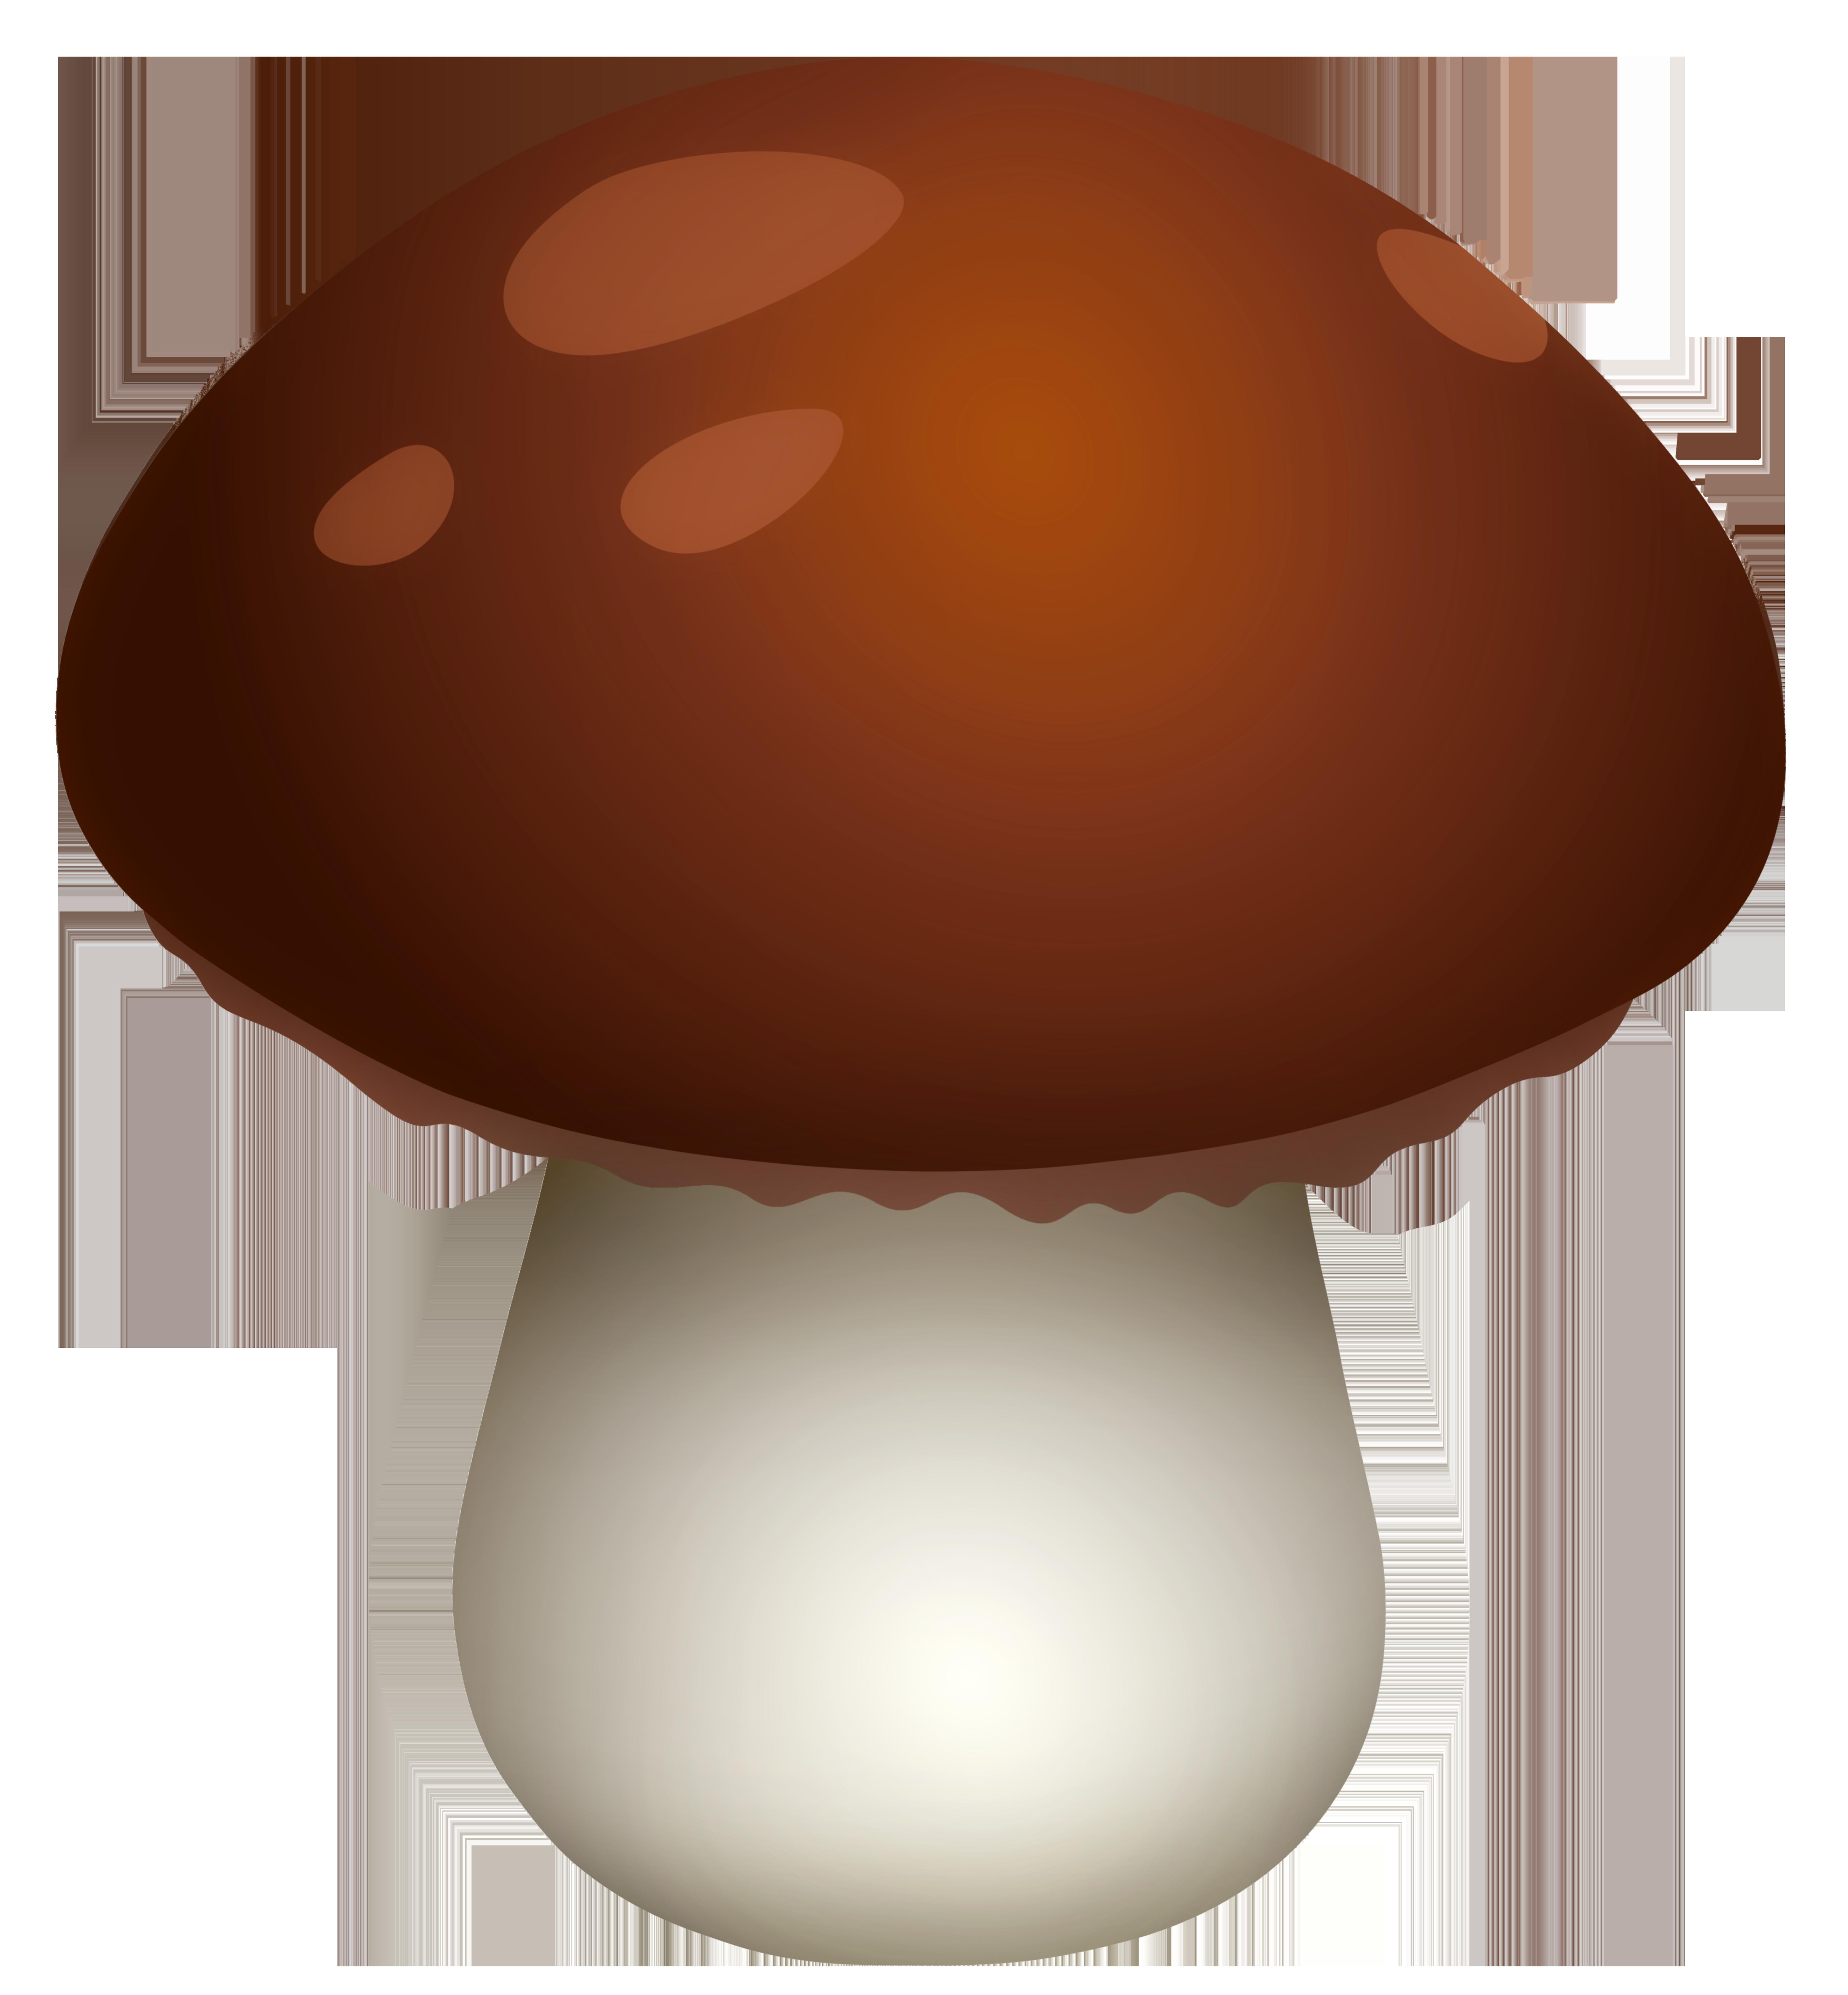 clip art freeuse library Dark brown mushroom png. Mushrooms clipart